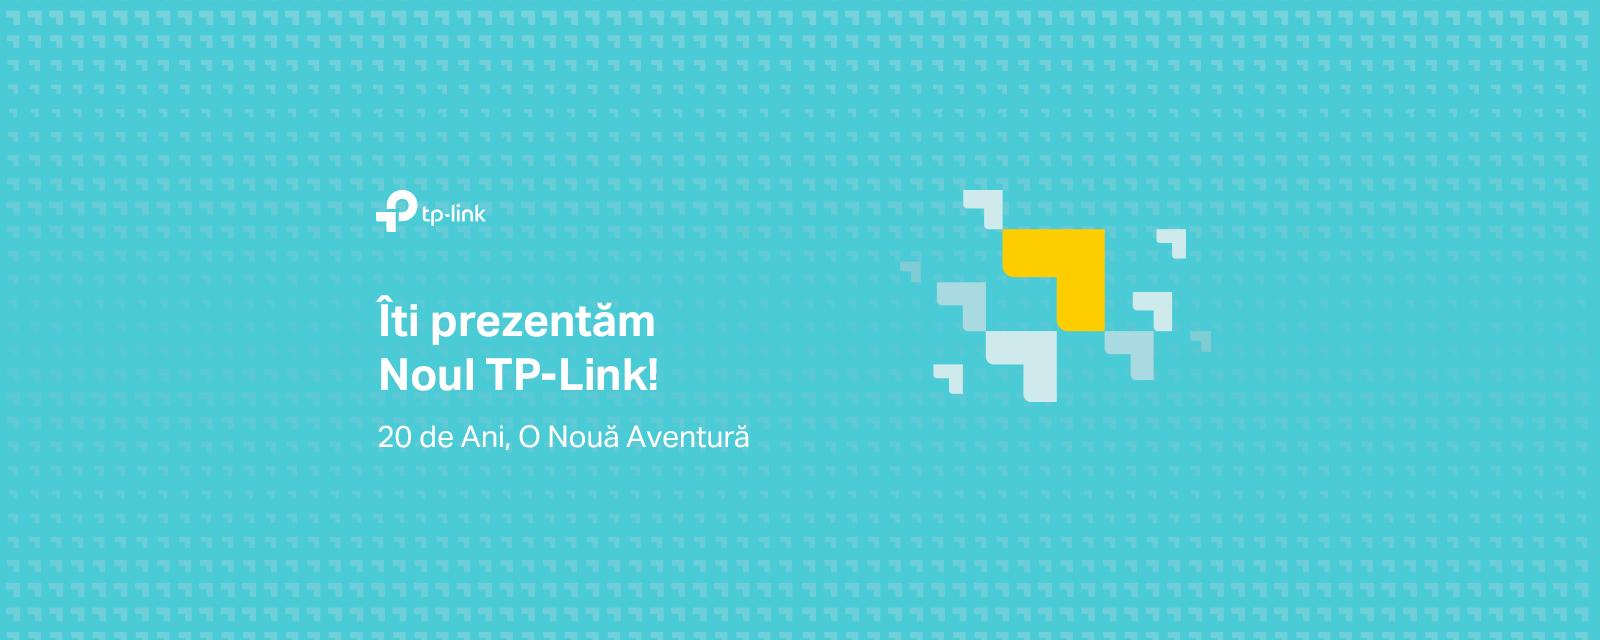 TP-Link noua identitate